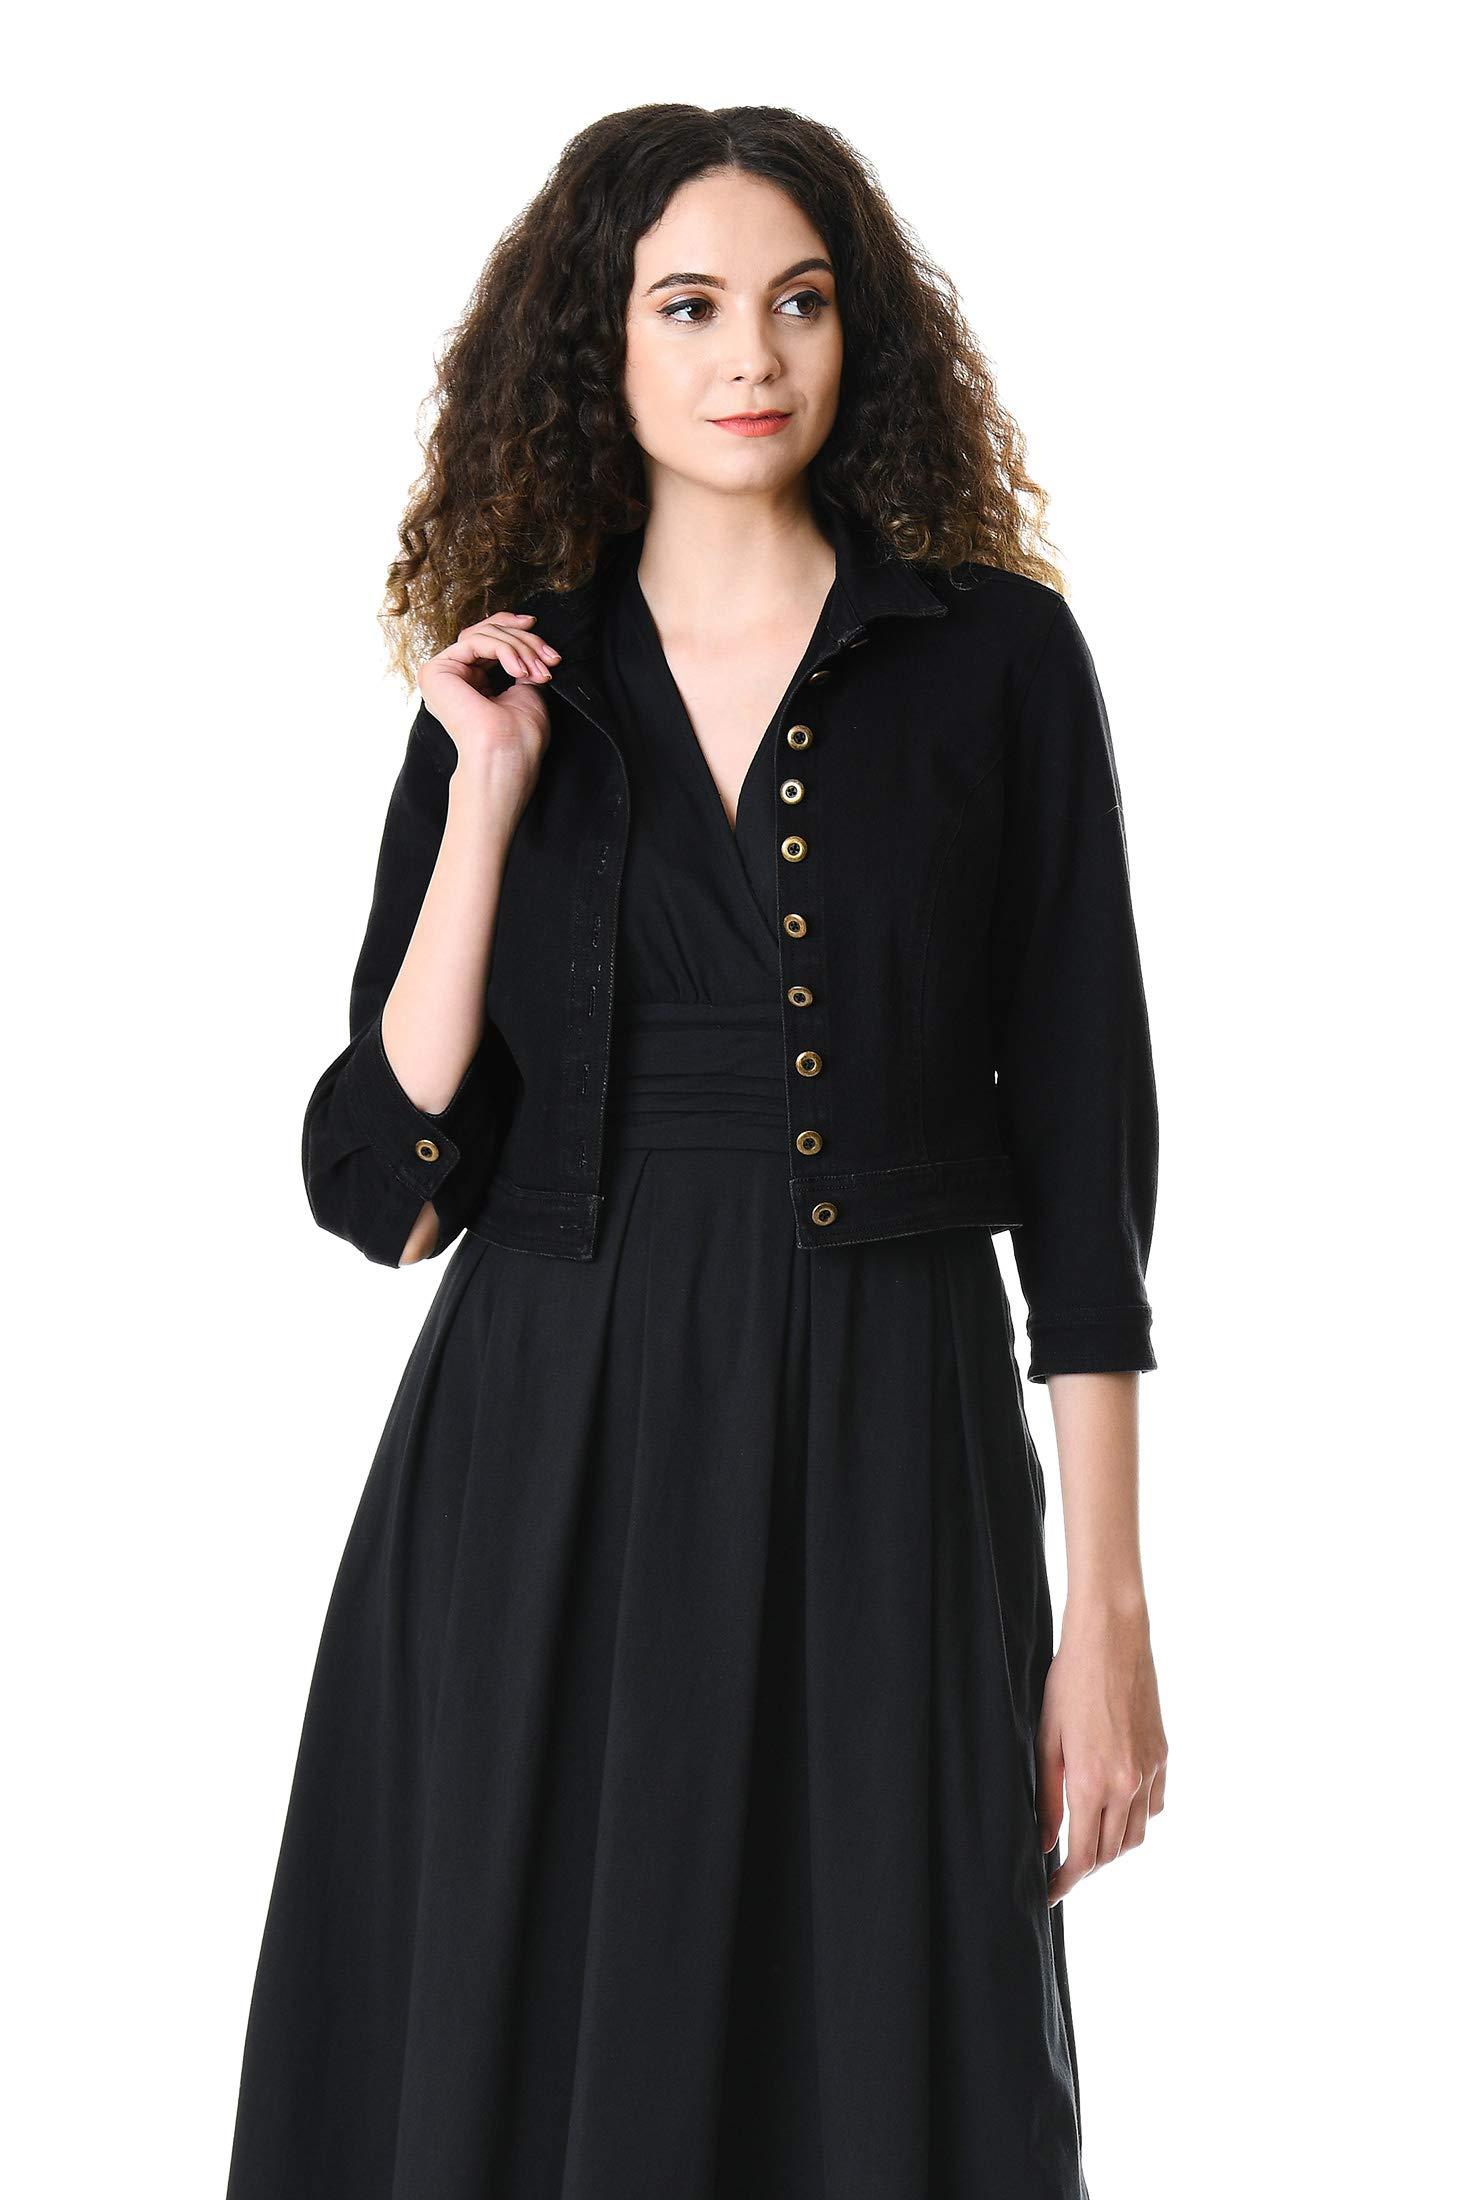 eShakti Women's Black Denim Crop Jacket 4X-28W Short Black